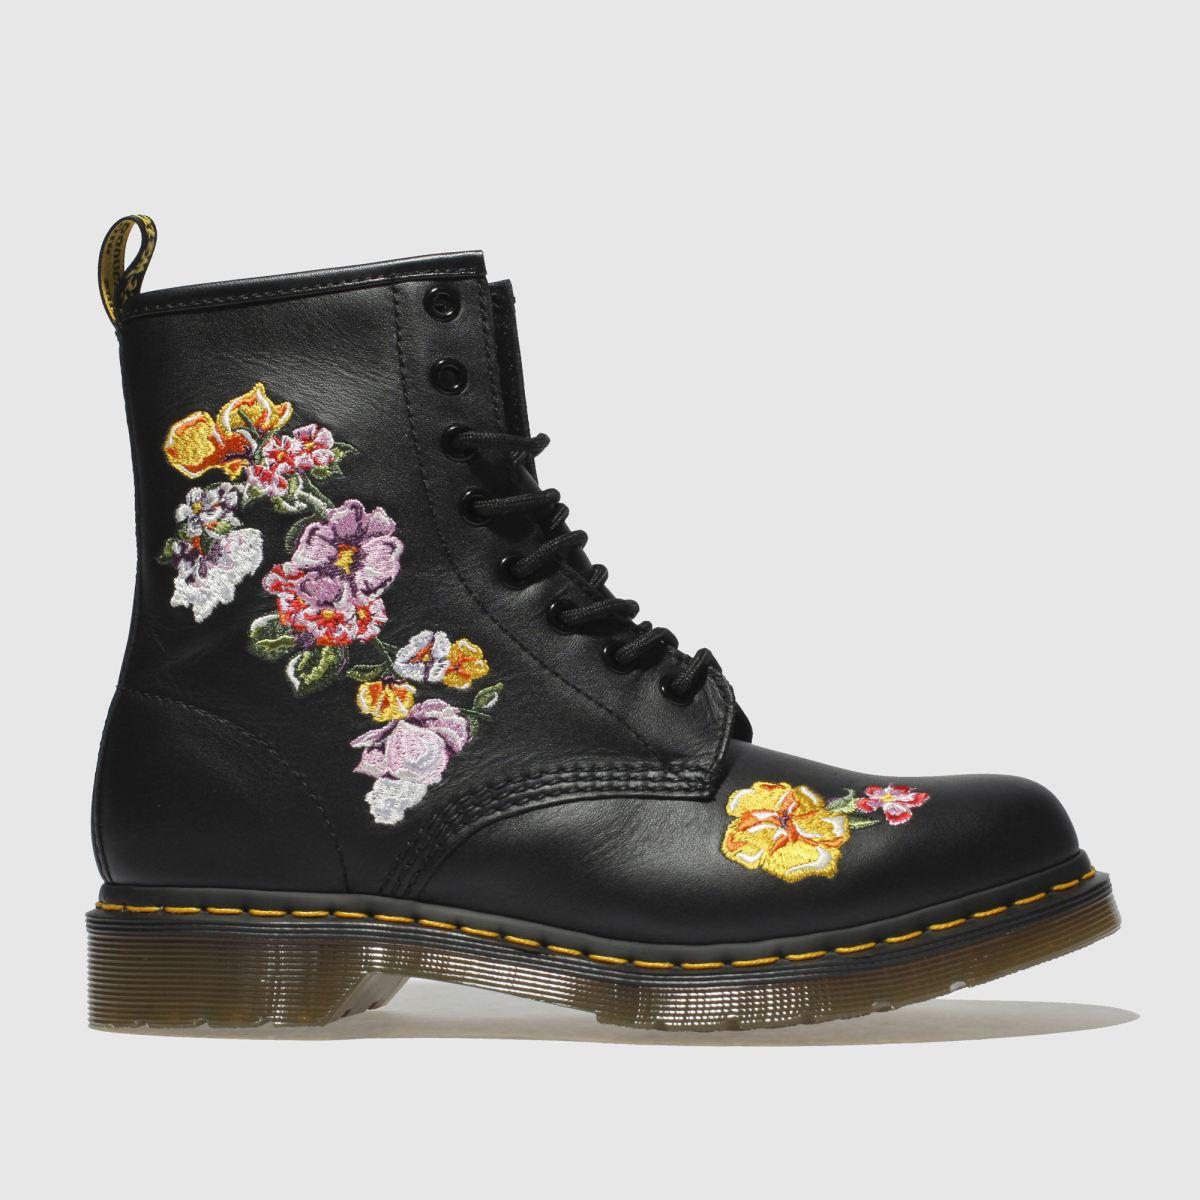 Dr Martens Black 1460 Vonda Ii Boots